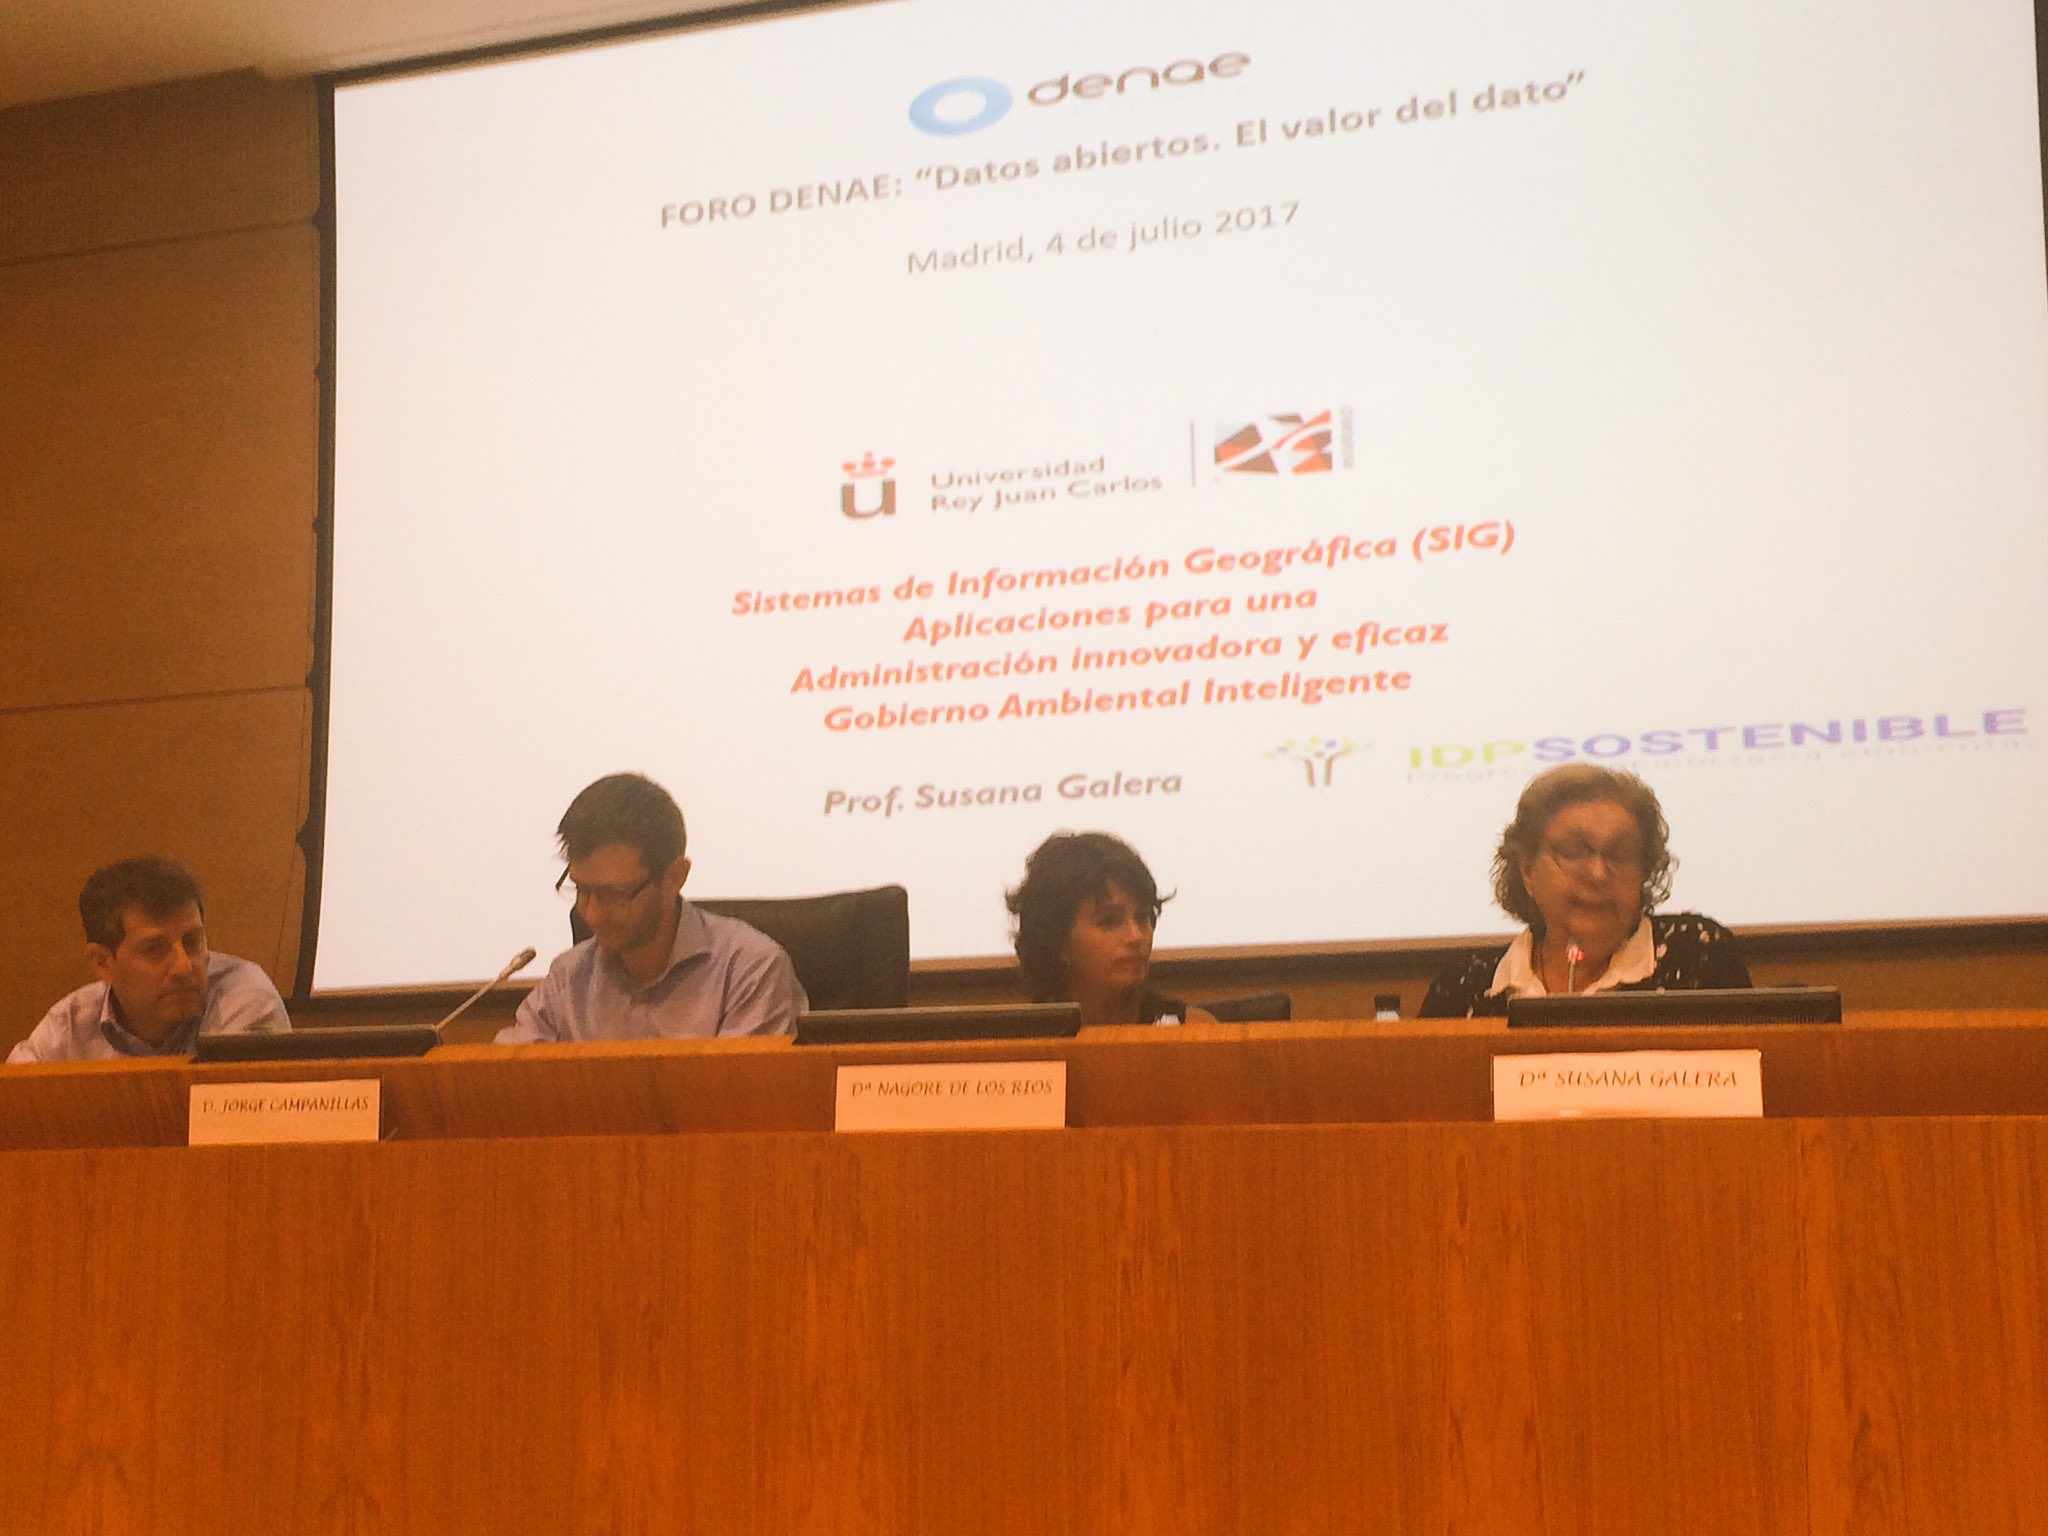 Turno de la mesa del sector privado en #opendata moderada por @jcampanillas #forodenae #SESIAD https://t.co/wmHOBKpc7U